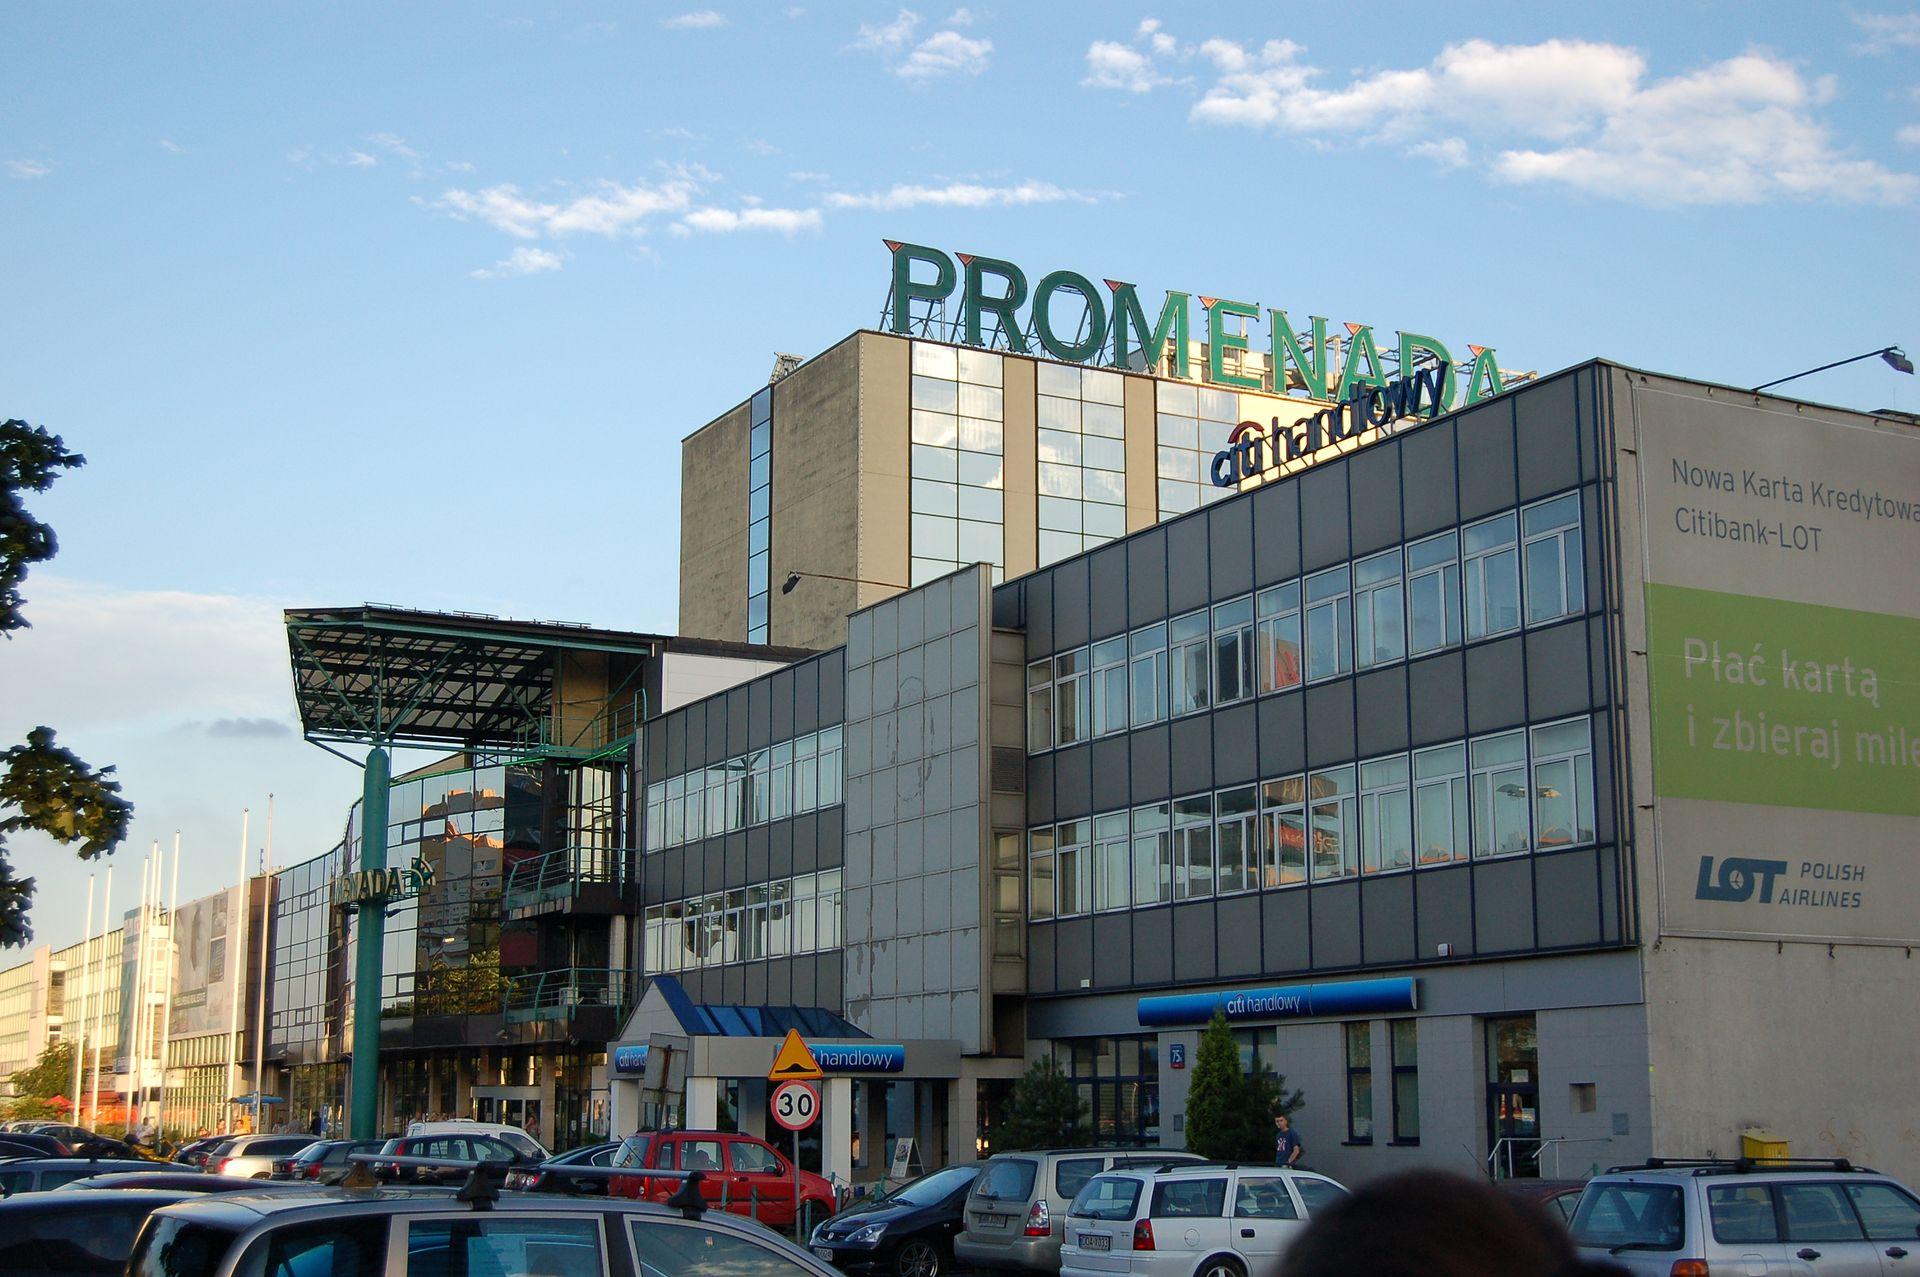 Atrium European kupiło centrum handlowe Promenada